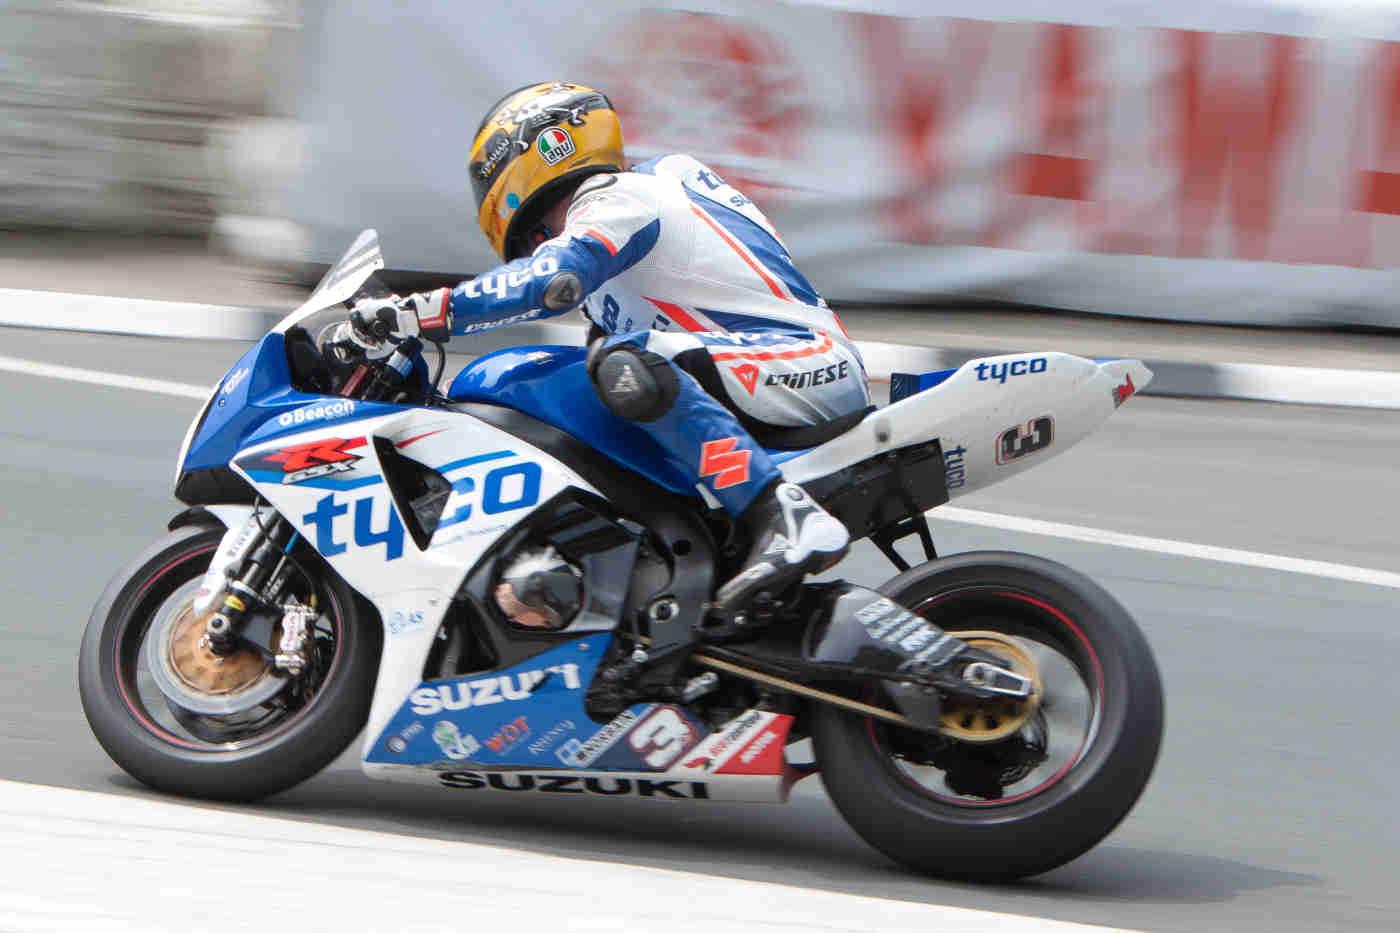 Dainese Superbike TT - 2012 #3. Guy Martin